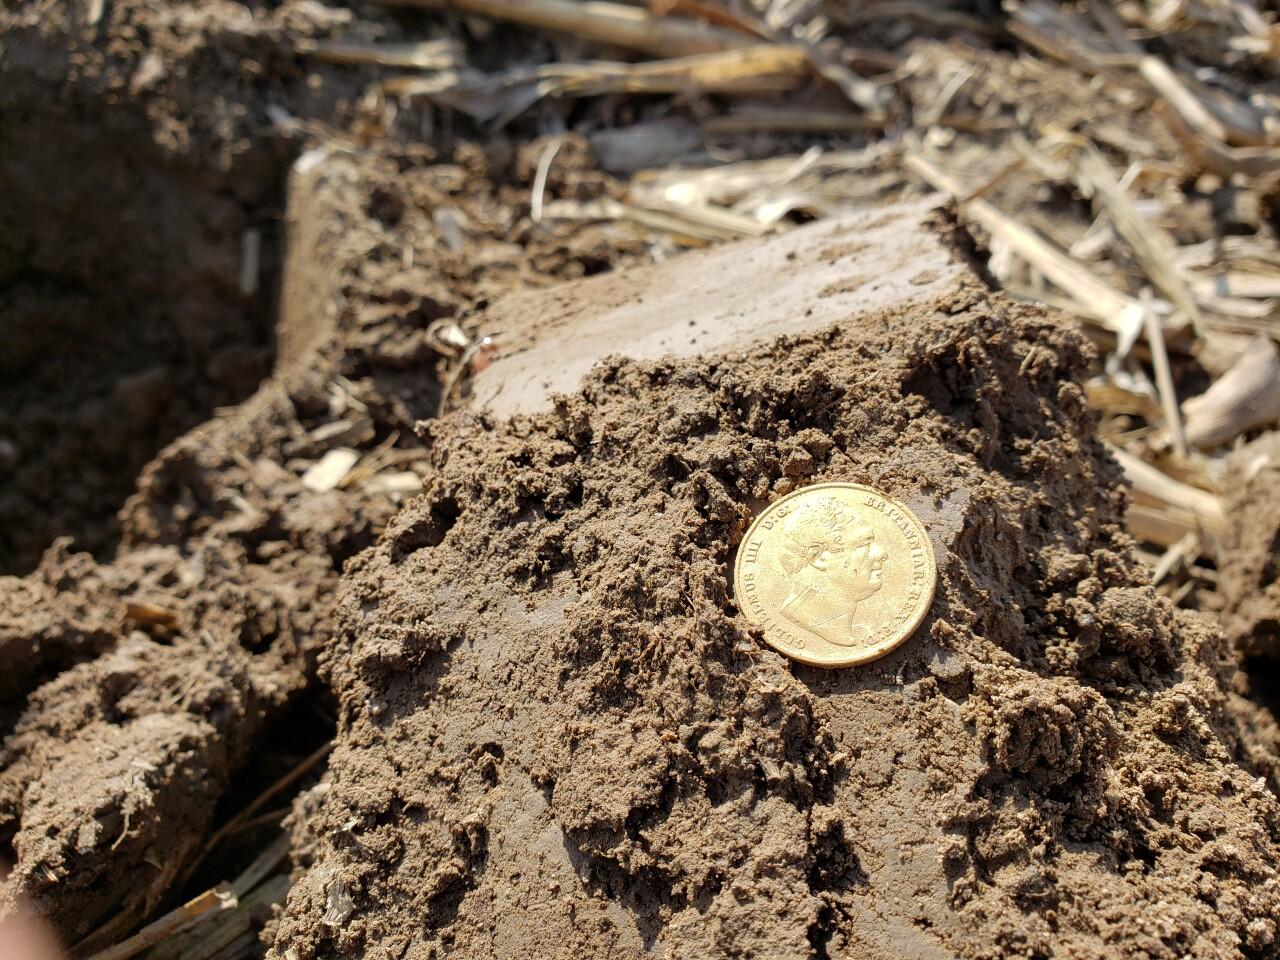 1837 British Gold Coin